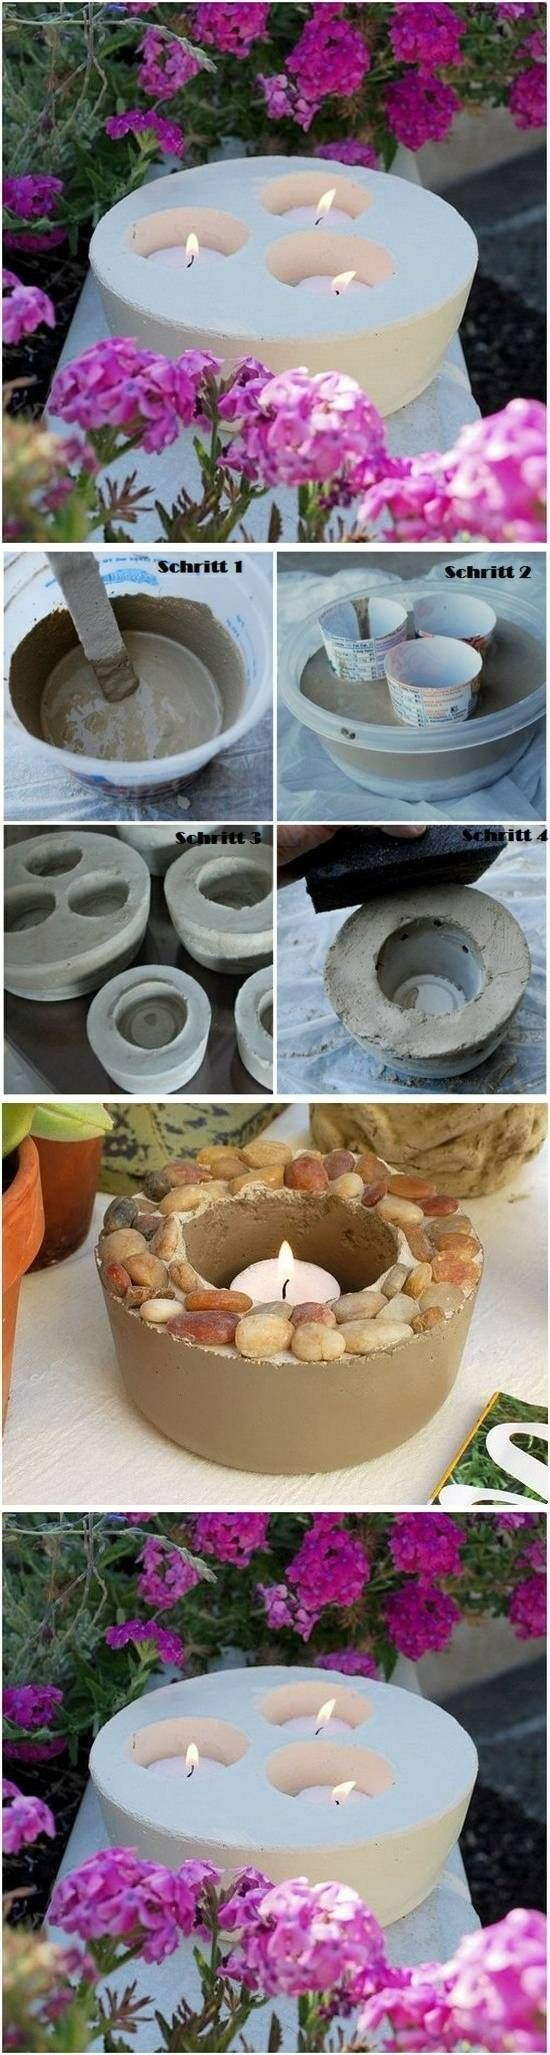 DIY Concrete Candlestick DIY Projects